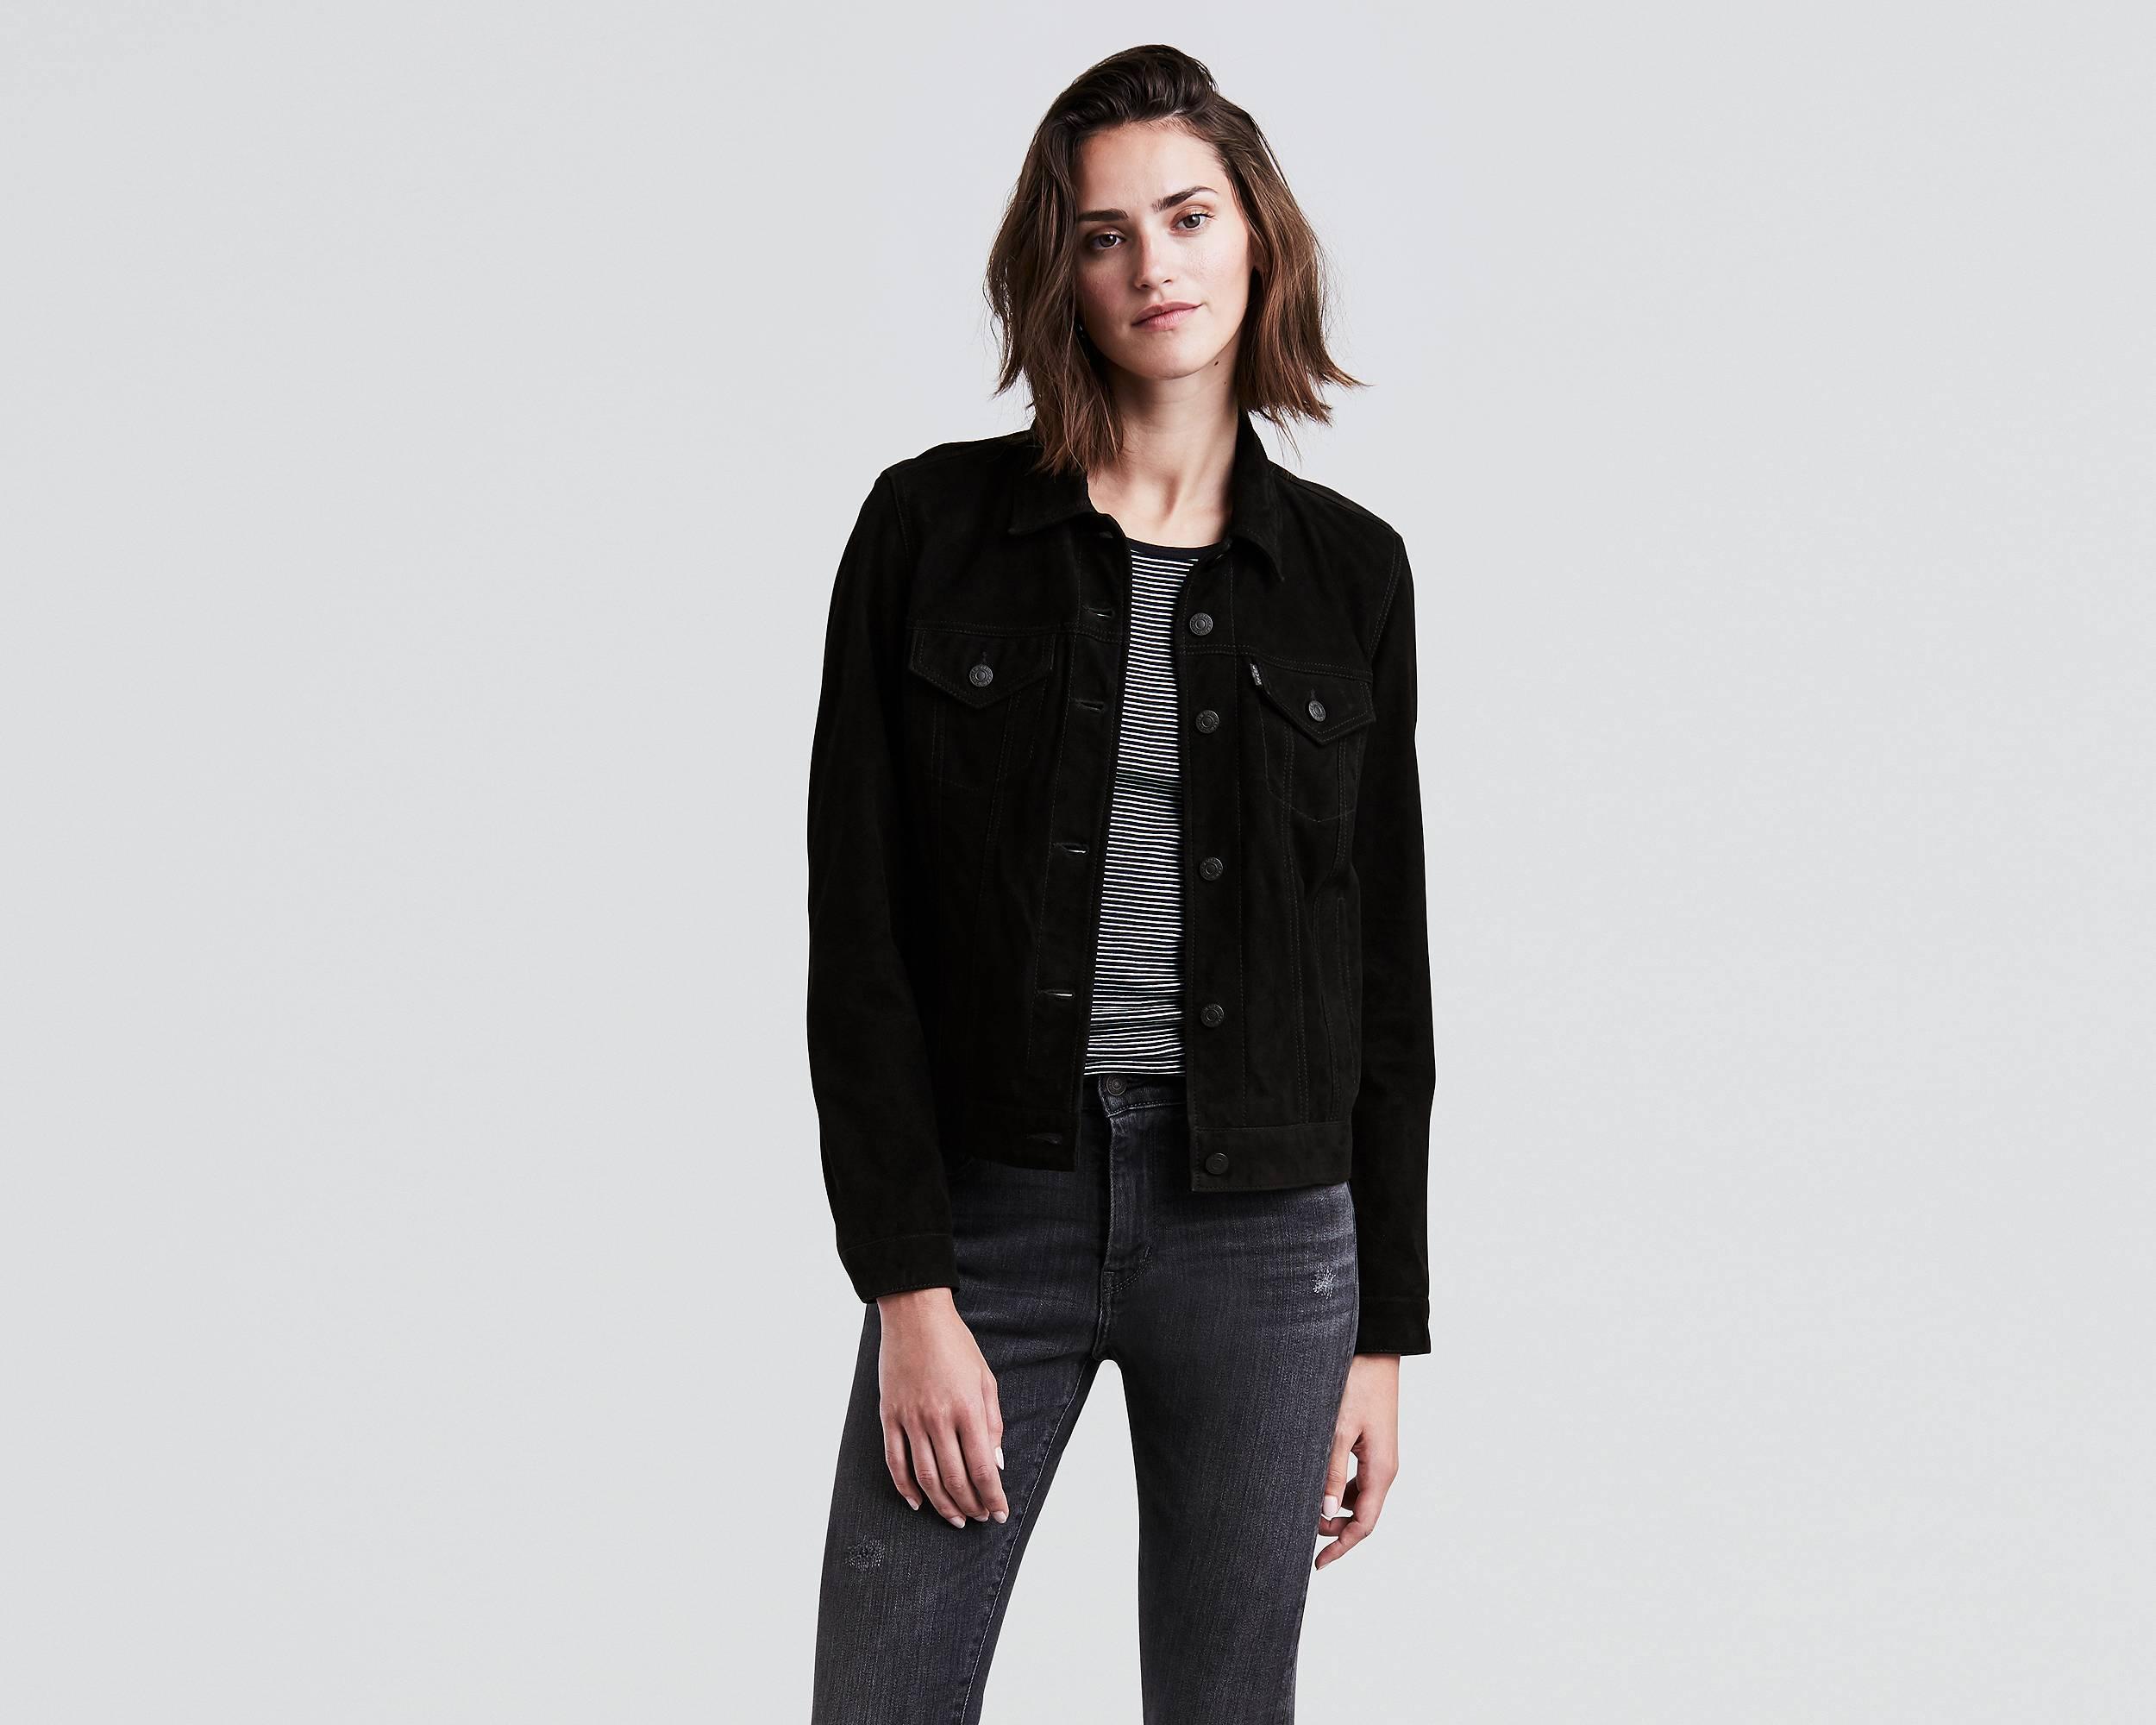 jean jacket quick view · suede trucker jacket tedribl